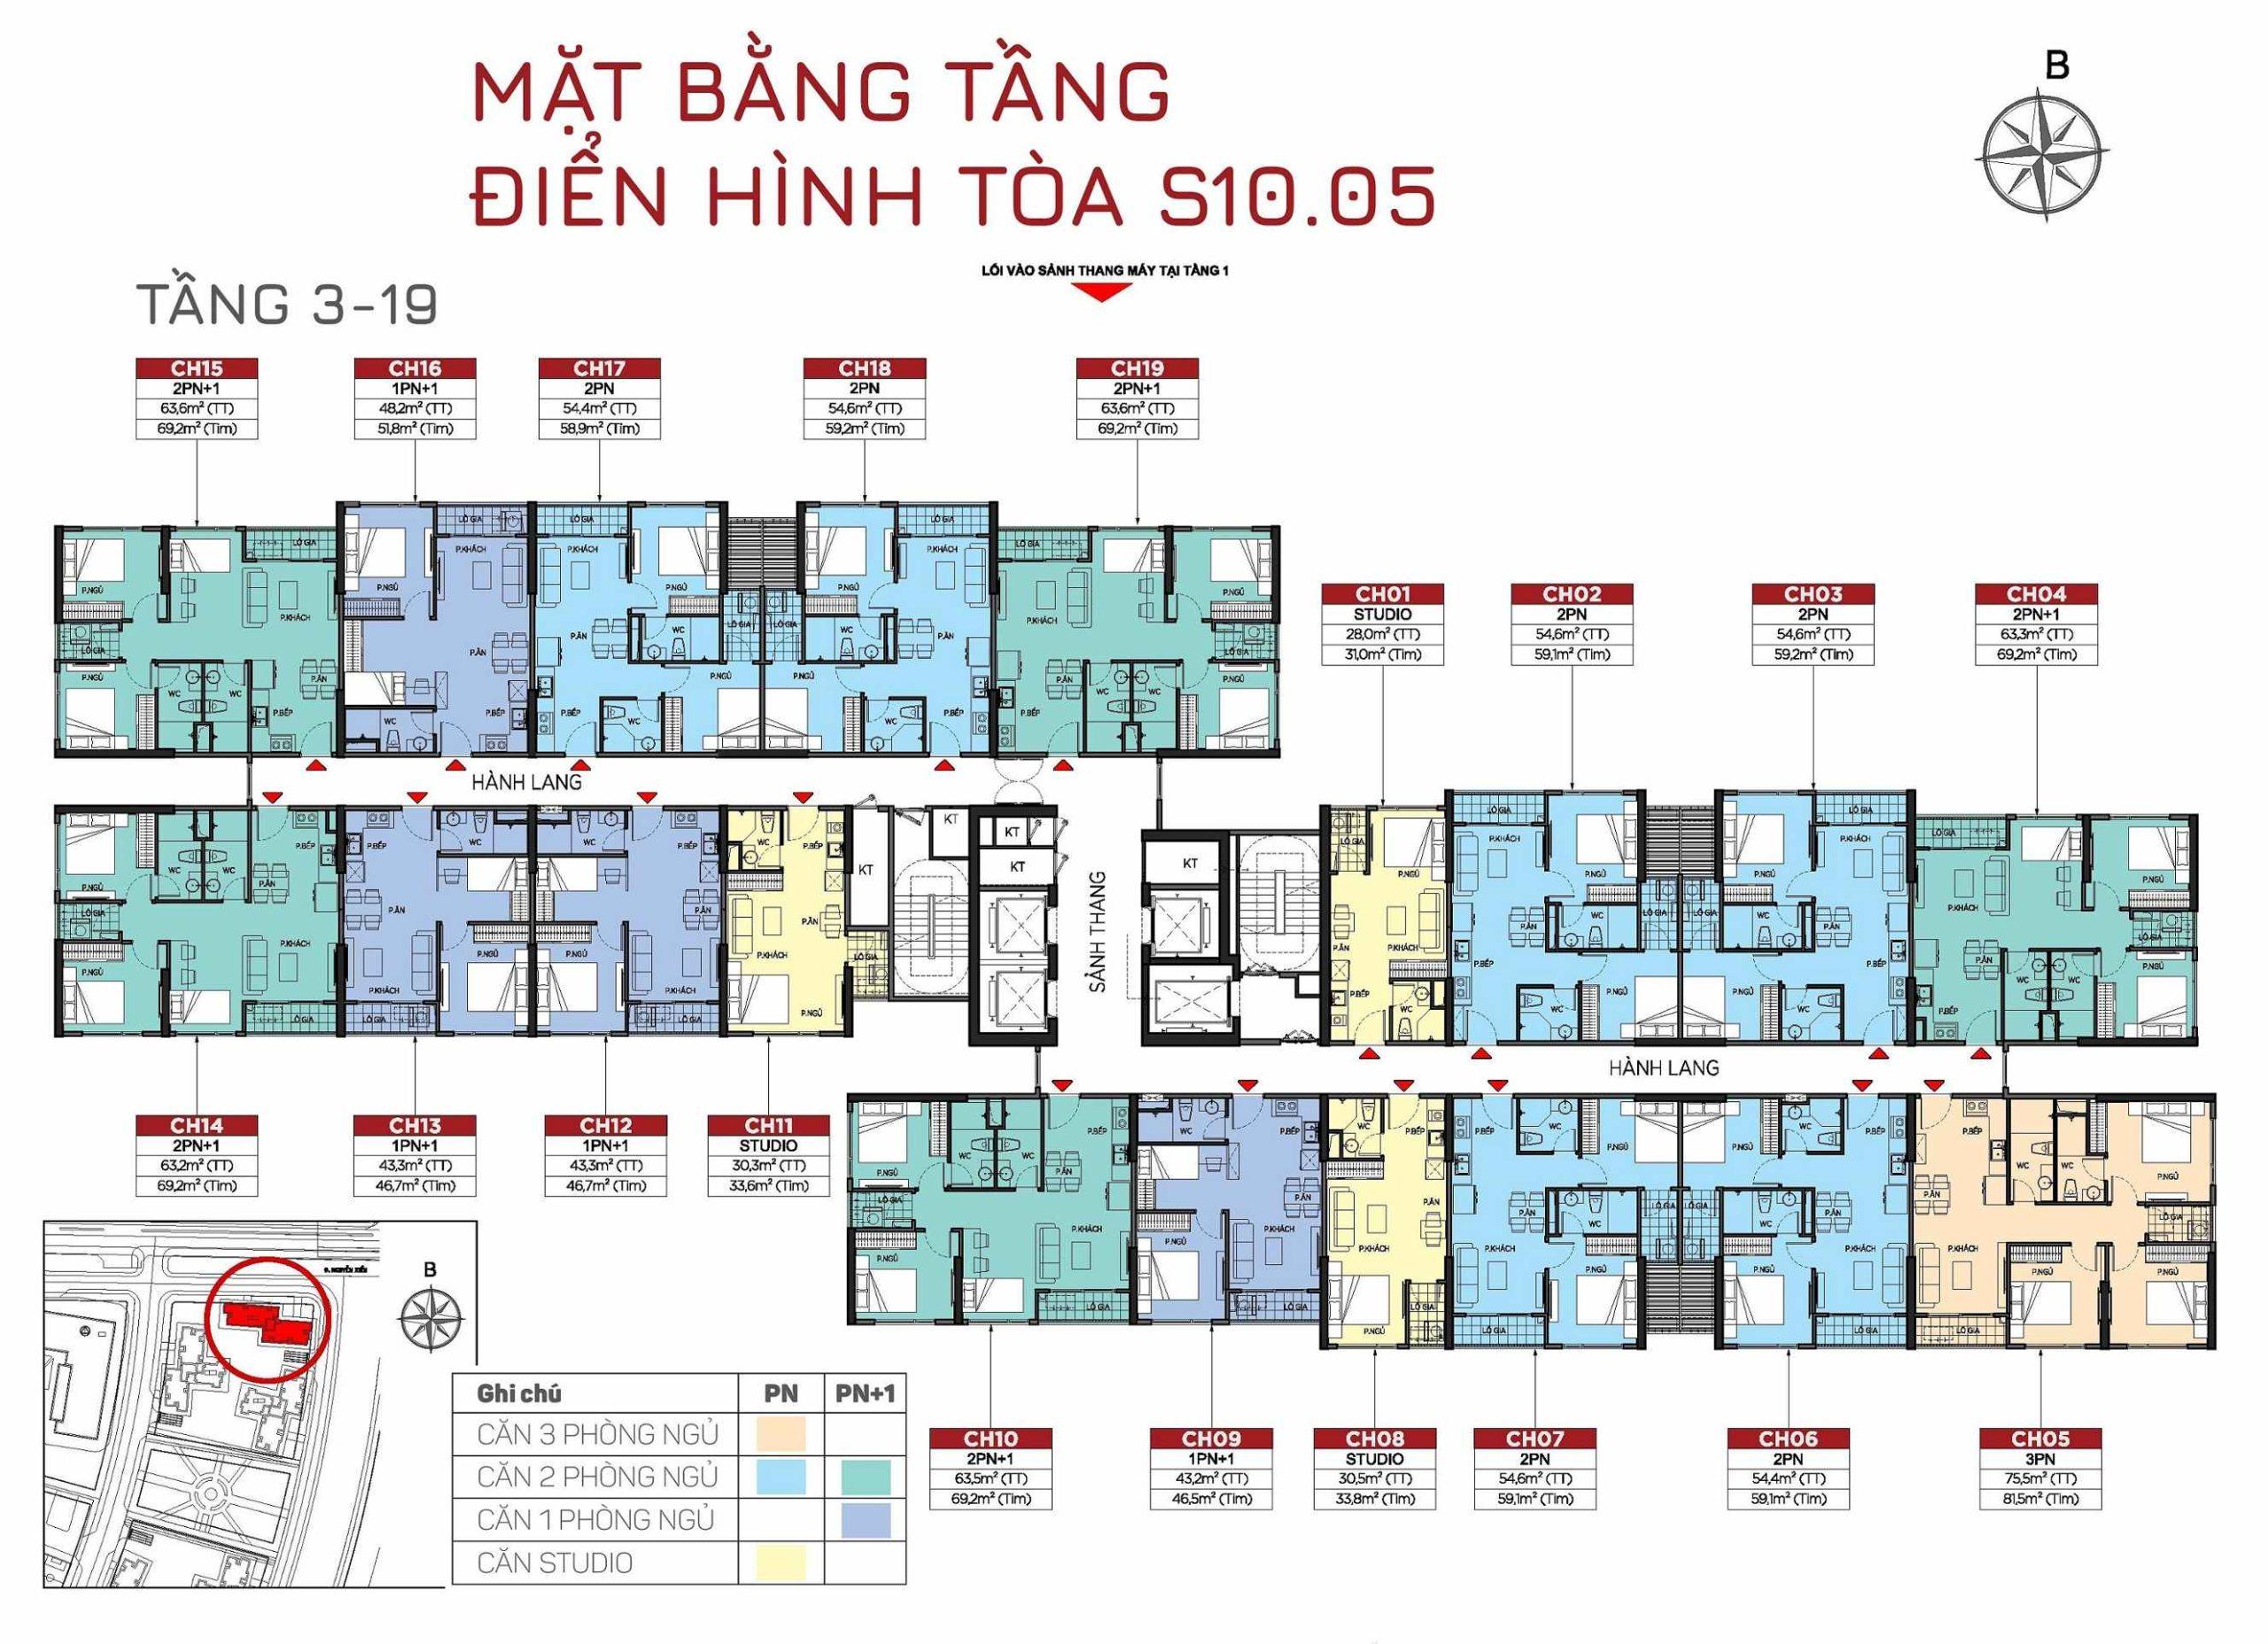 Mat-bang-s1005-the-origami-tang-3-19